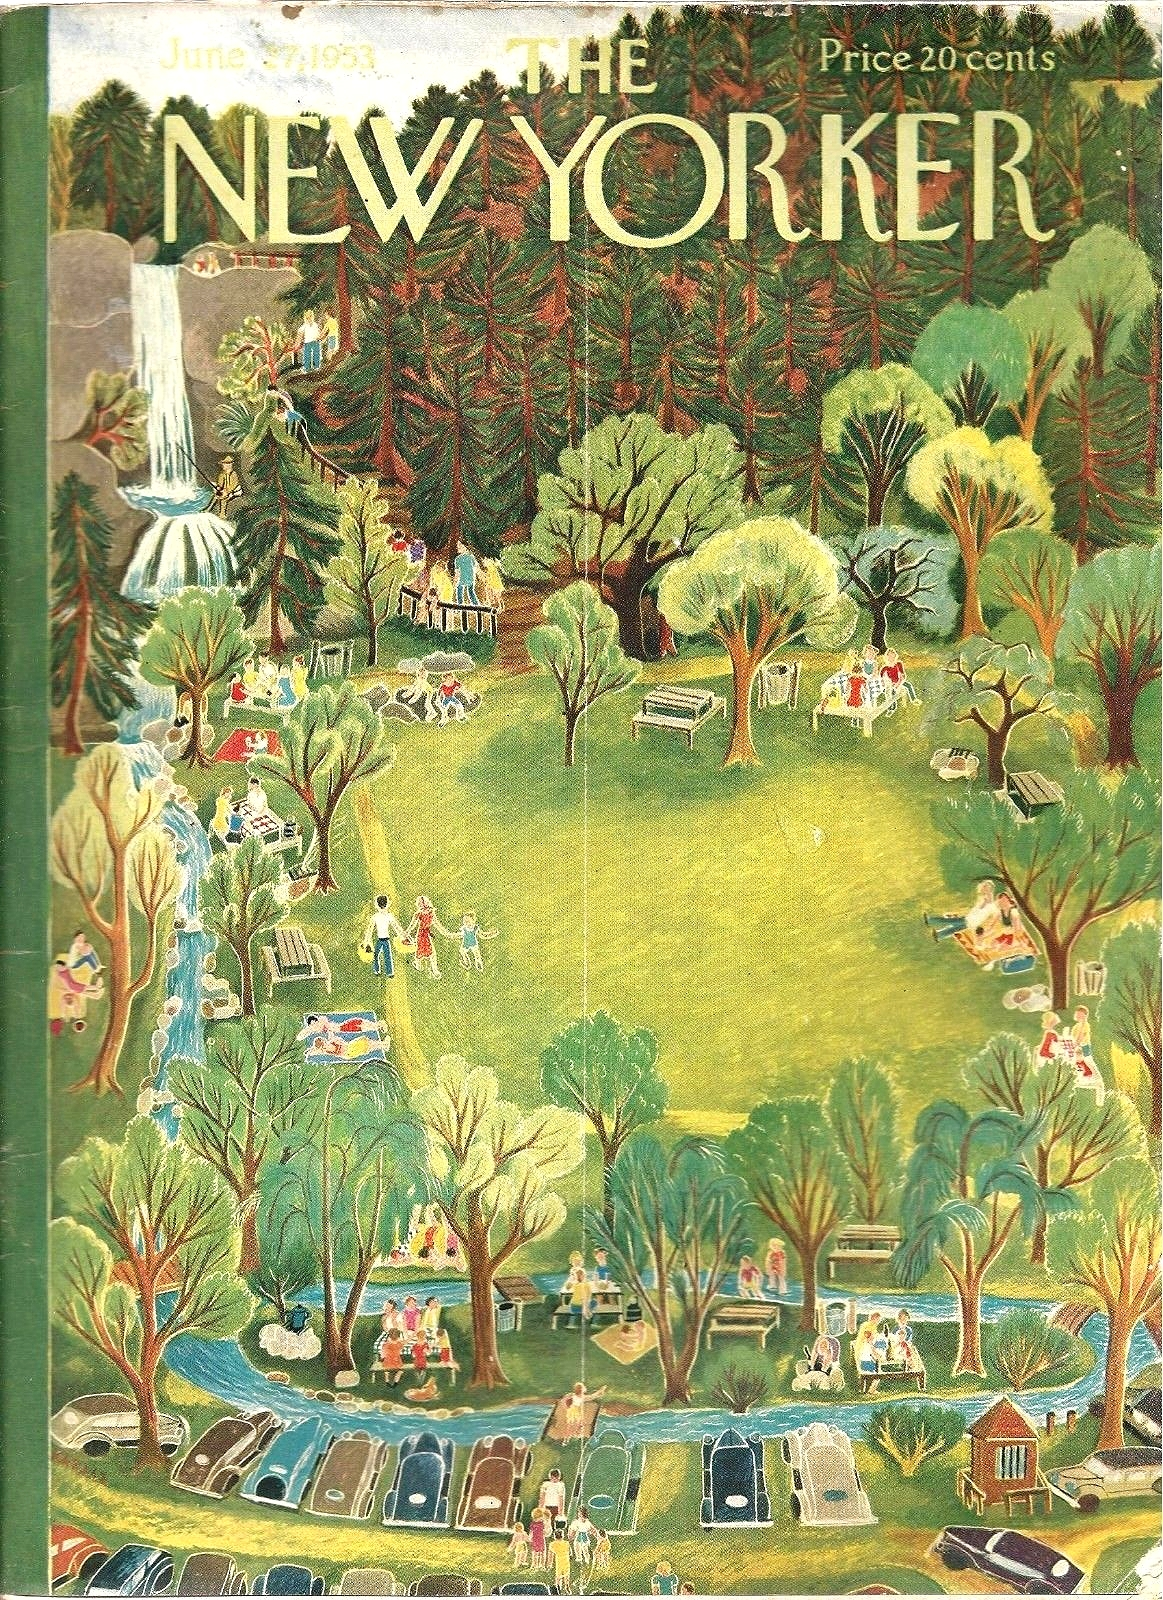 The New Yorker June 1953 | Ilonka Karasz via  THE JUMPING FROG